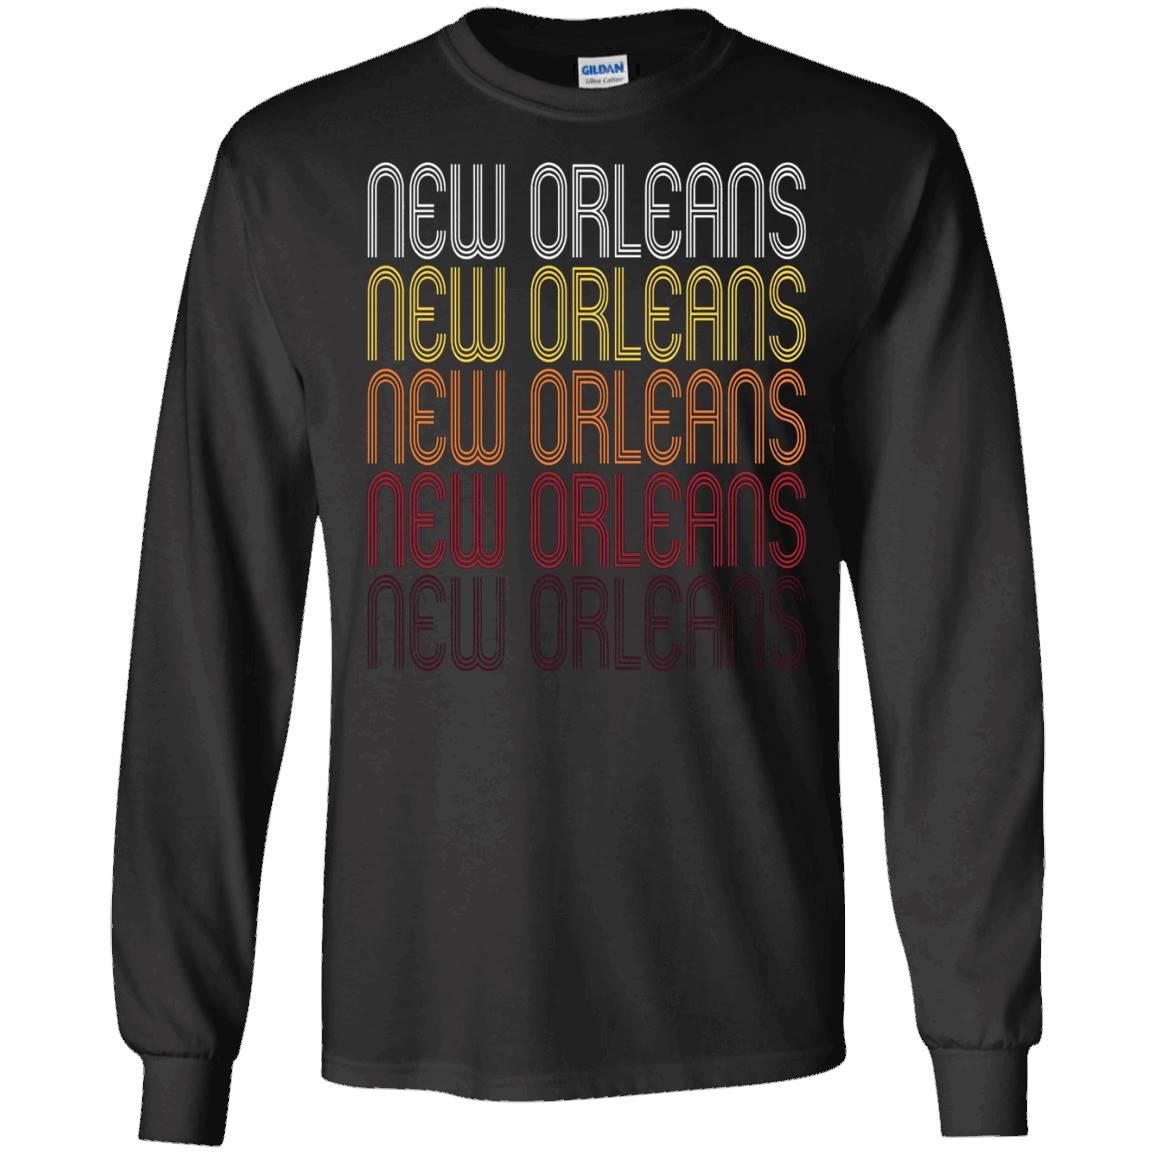 New Orleans, LA Vintage Style Louisiana T-shirt – Long Sleeve Tee